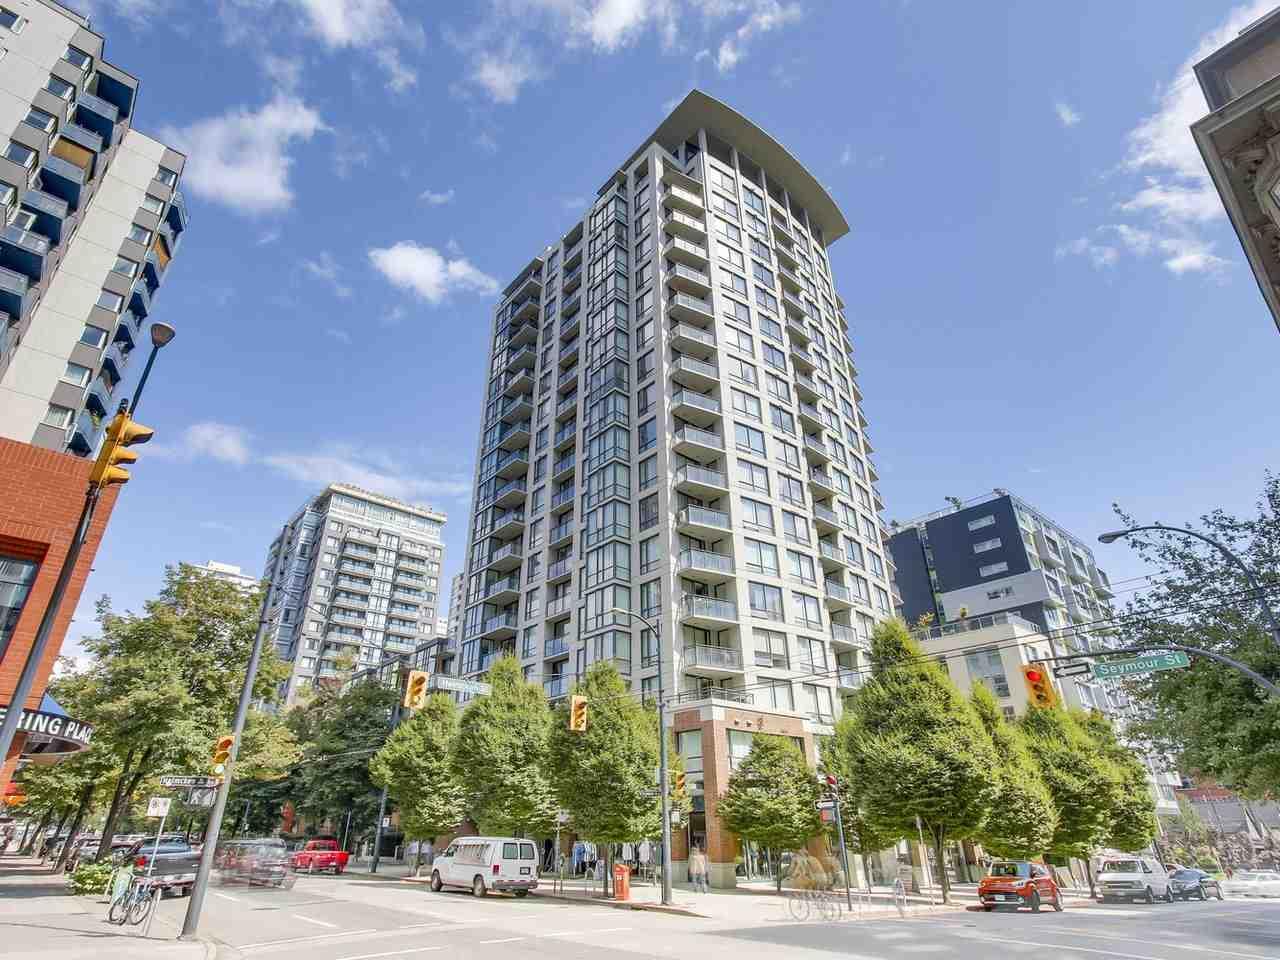 Condo Apartment at 808 1082 SEYMOUR STREET, Unit 808, Vancouver West, British Columbia. Image 1